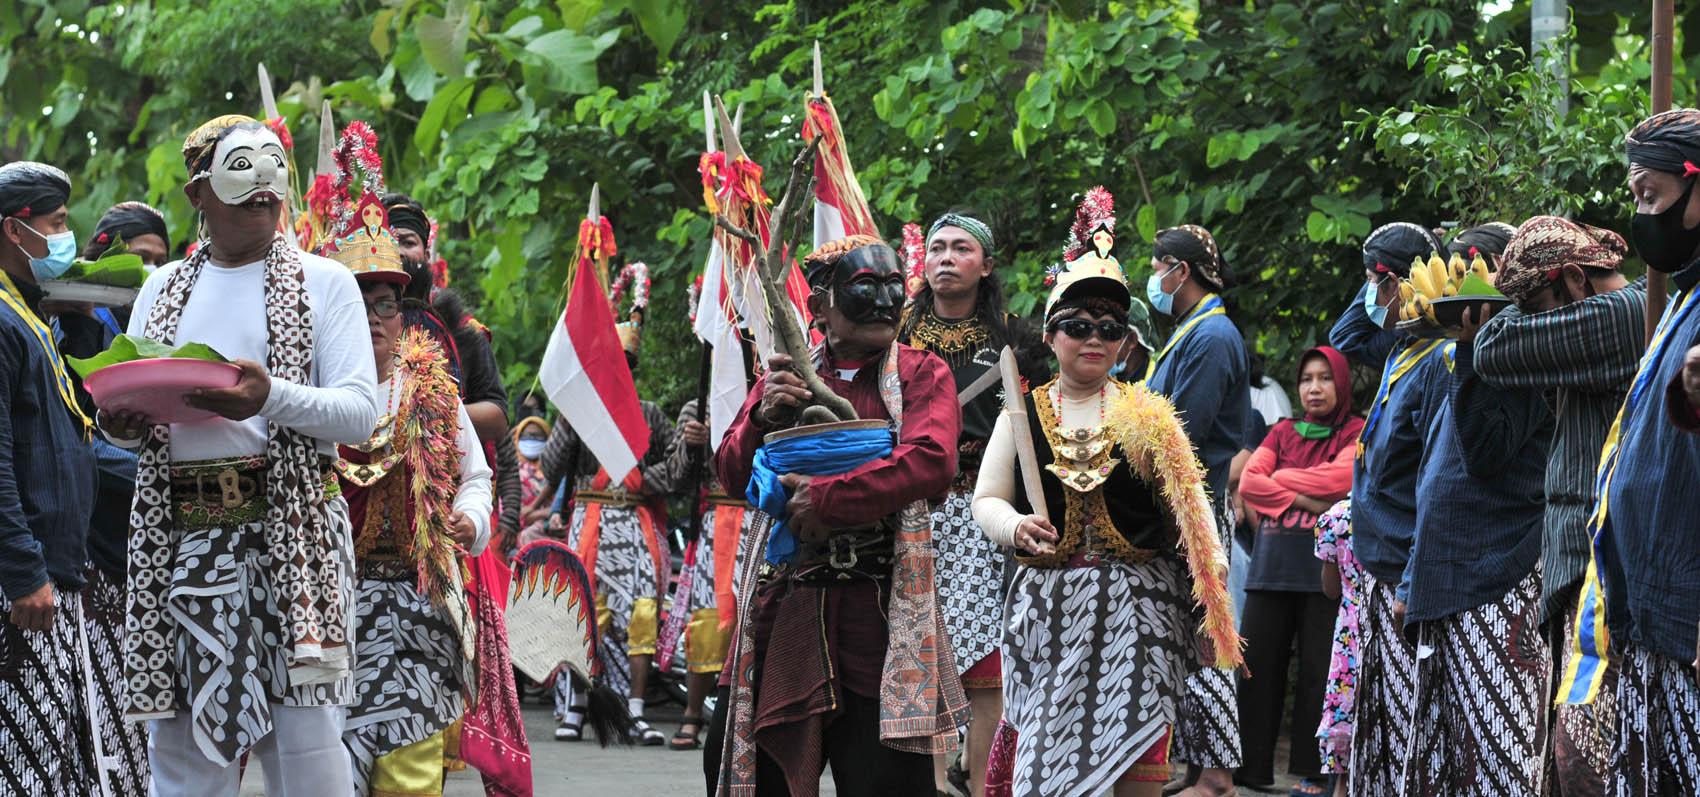 Beles membawa bibit resan, beserta rombongan reyog akan menyerahkan ubarampe ritual Midang kepada pemangku adat.[Foto:Padmo]